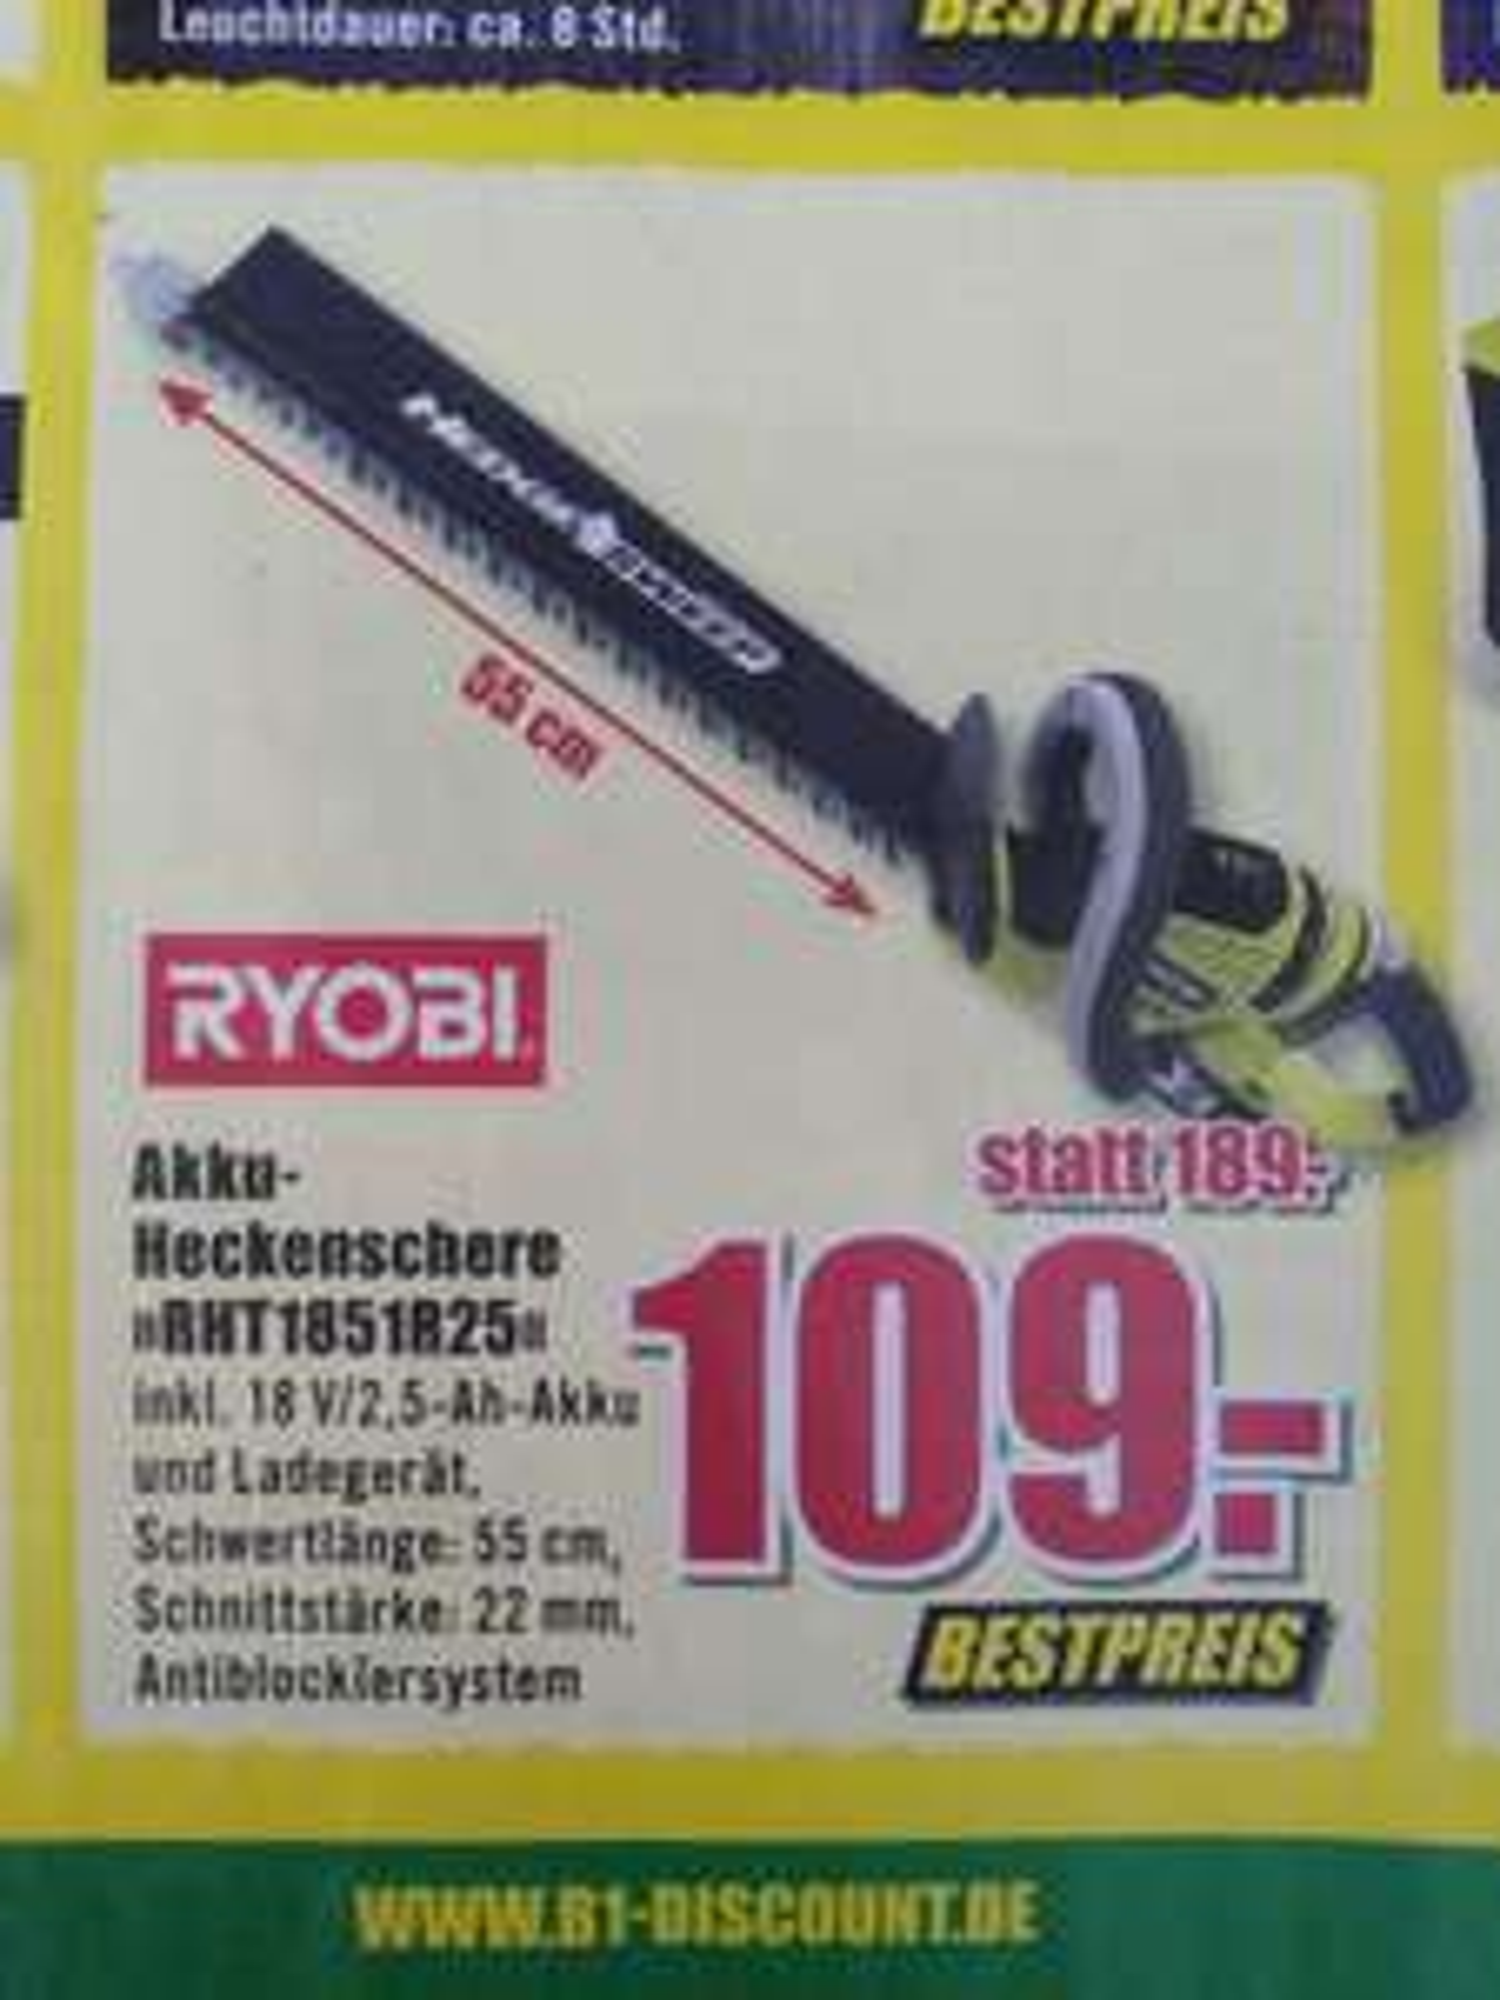 RYOBI Akku Heckenschere RHT1851R25 bei B1 (offline)